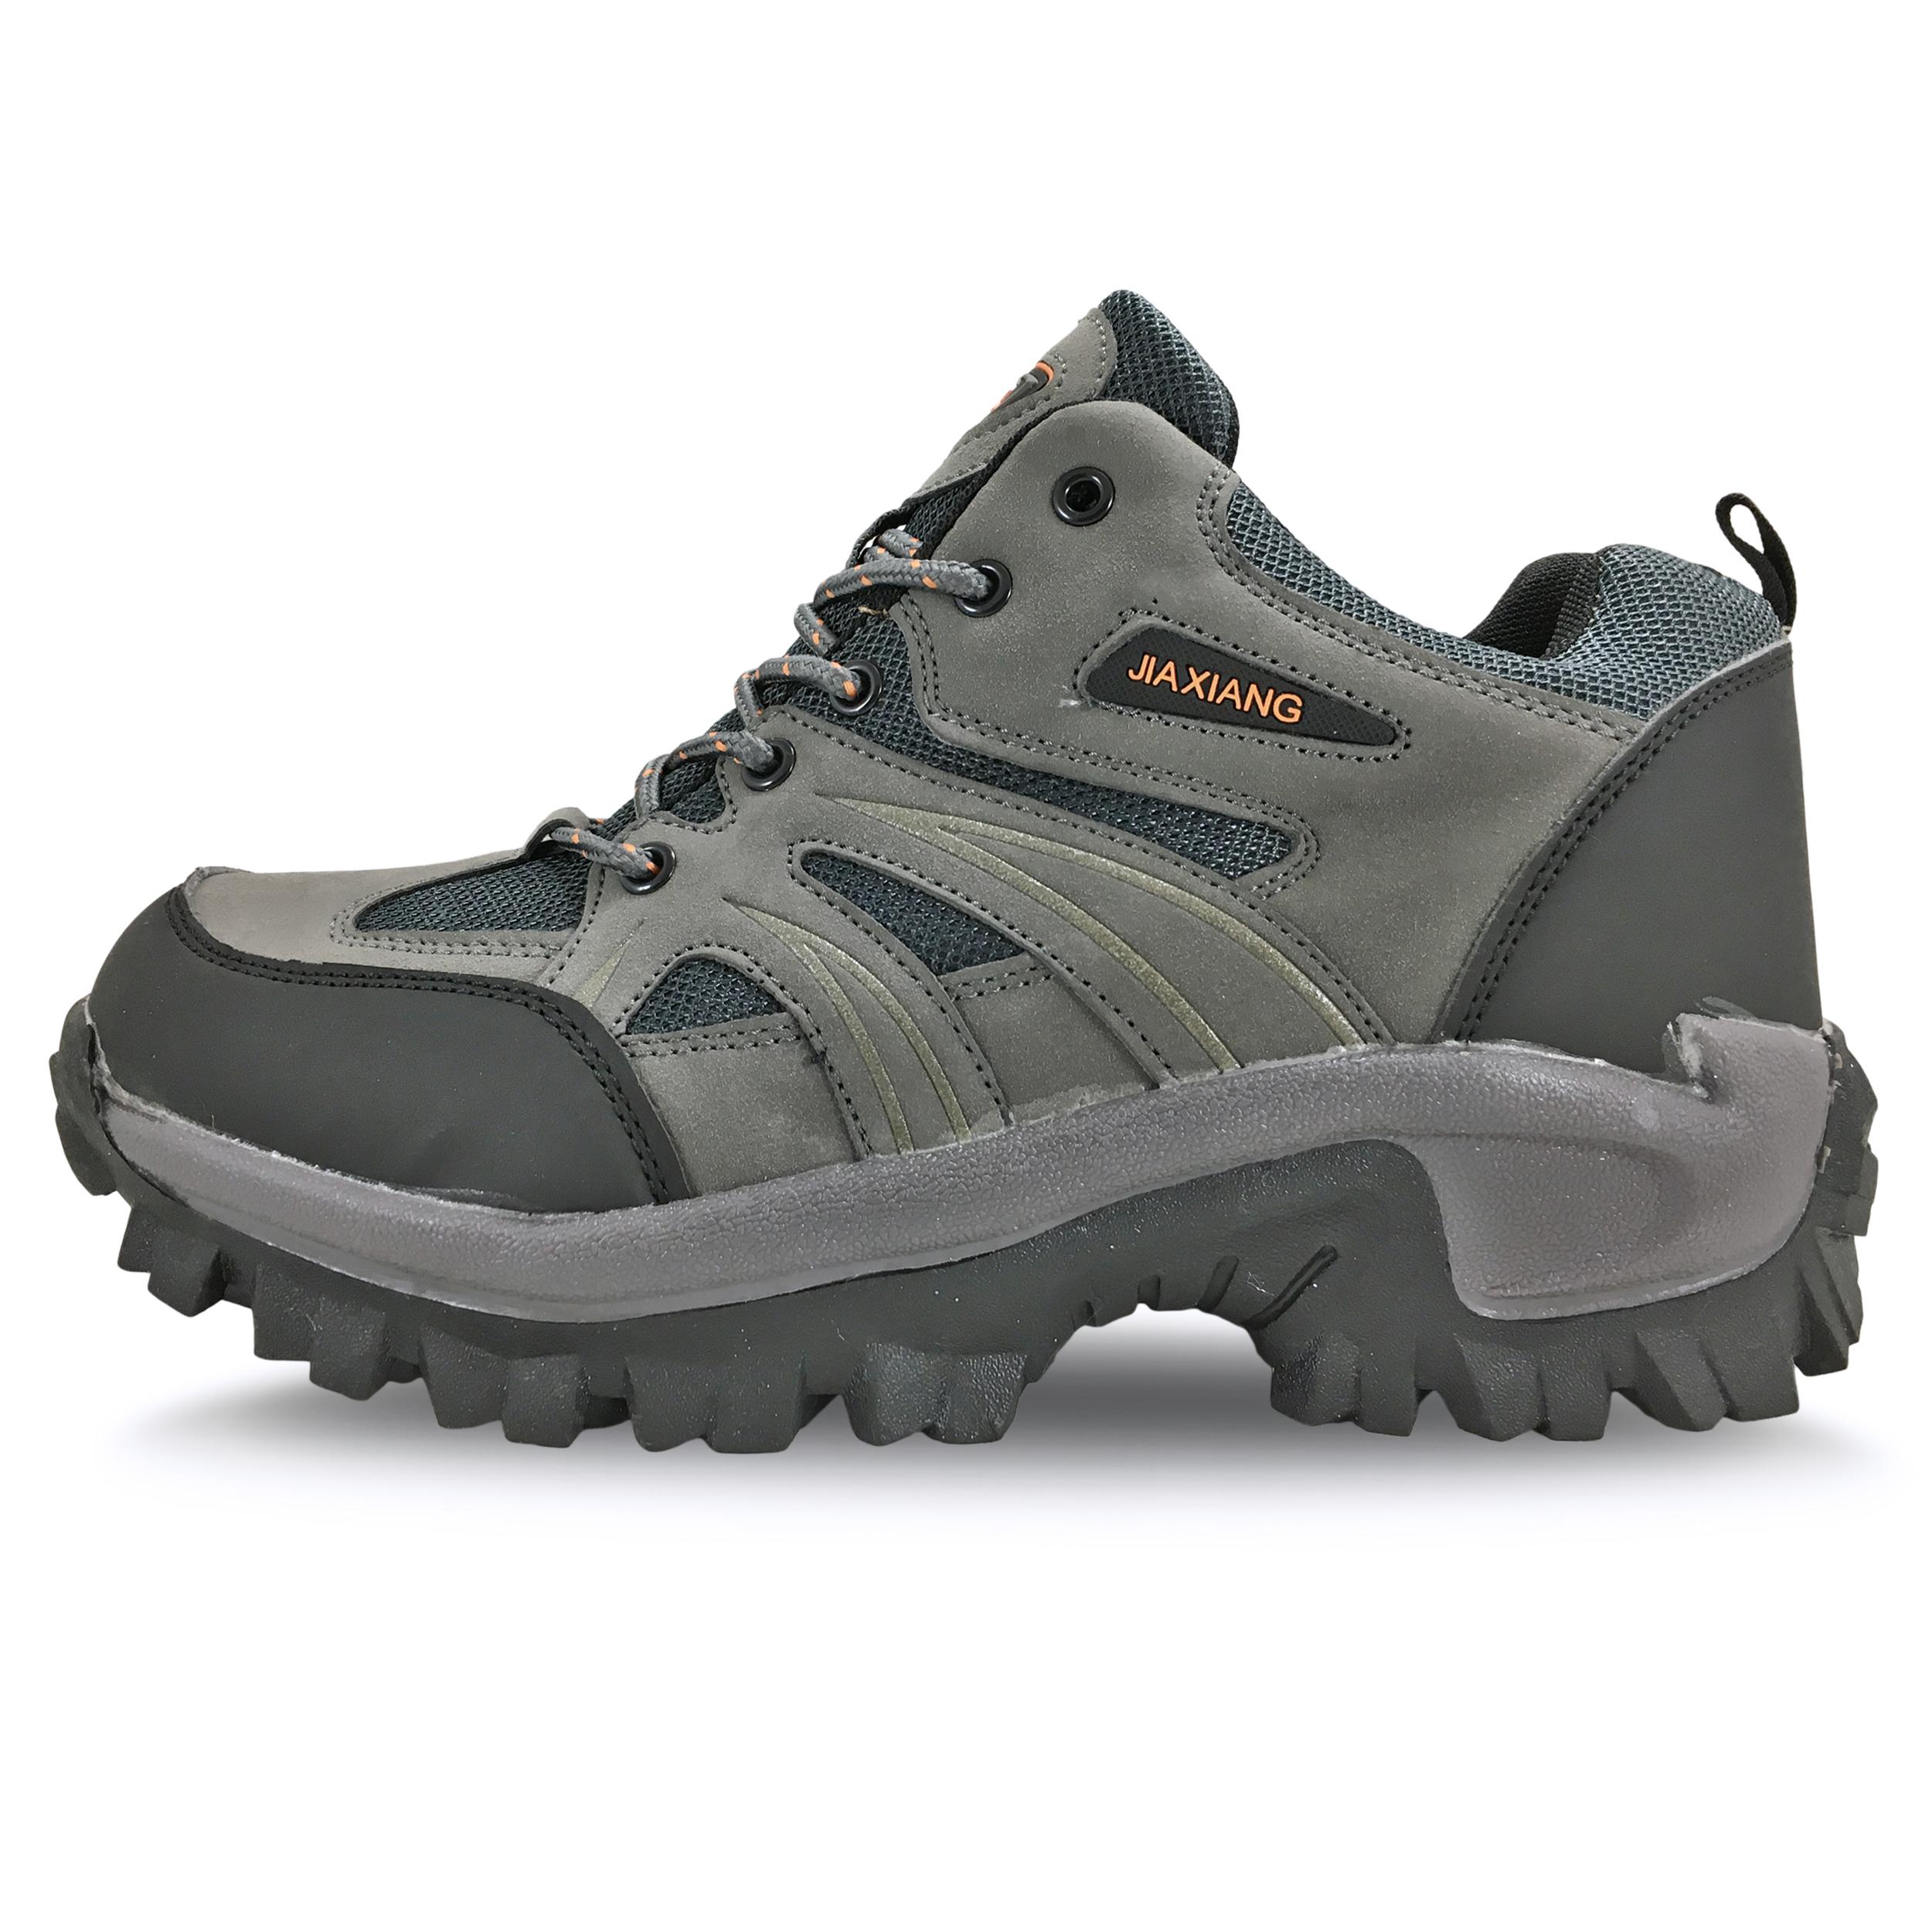 قیمت کفش کوهنوردی مردانه جیاکسیانگ کد SJ105